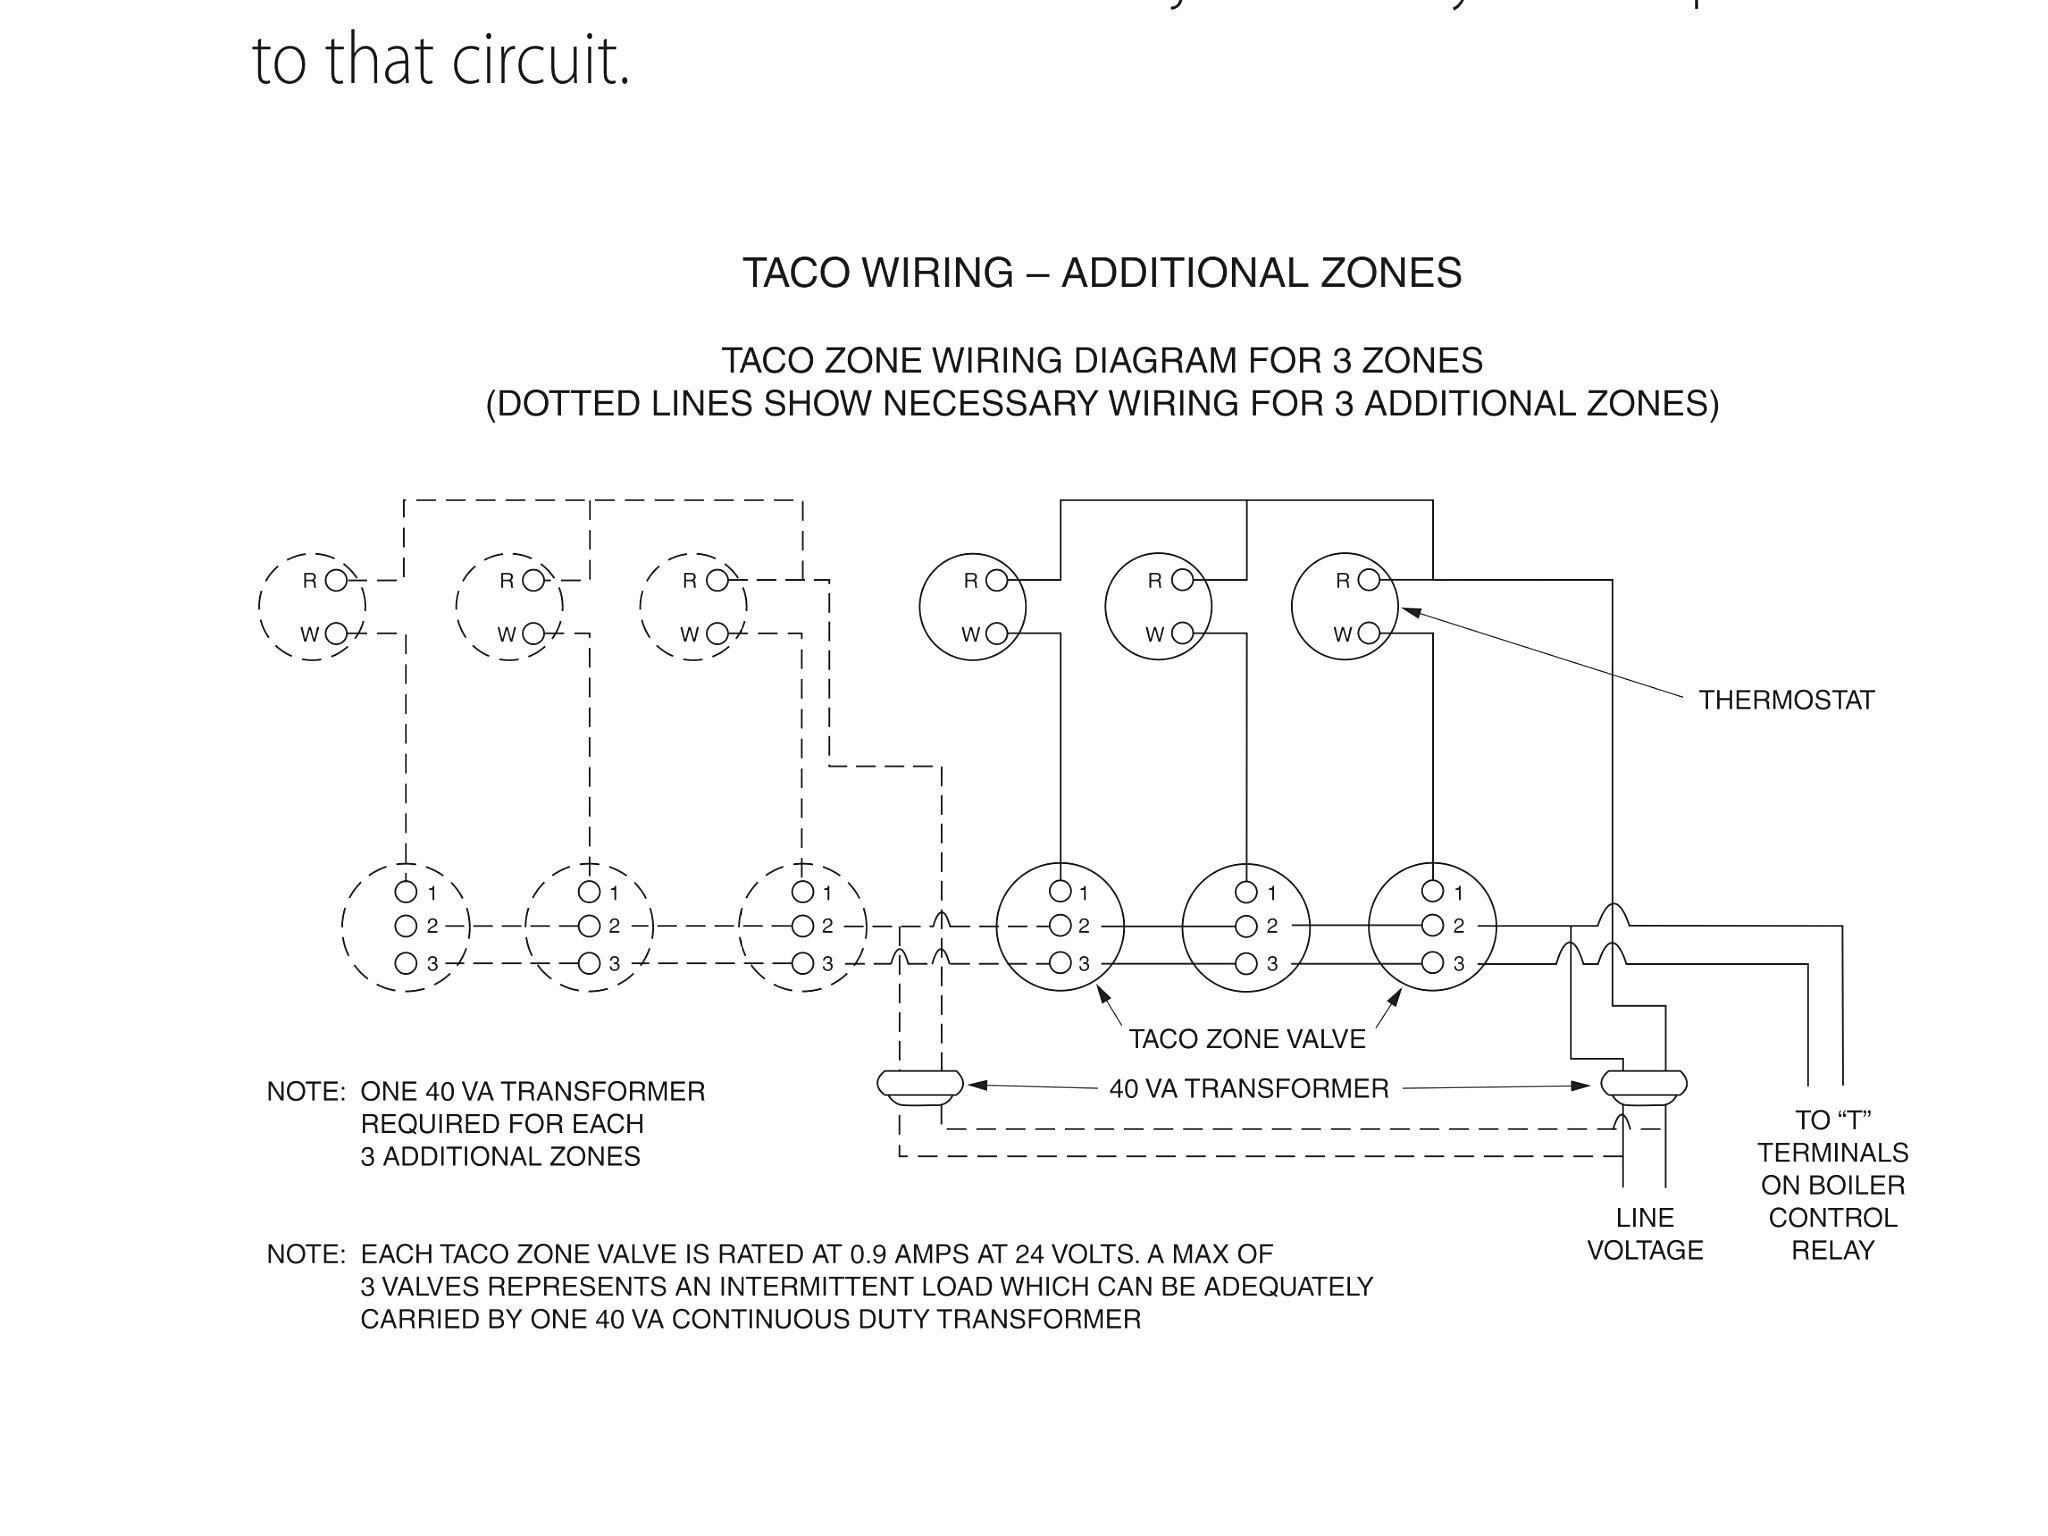 Taco Zone Valves Wiring Diagram Circulating Pump Wiring Throughout Taco Zone Valve Diagram for